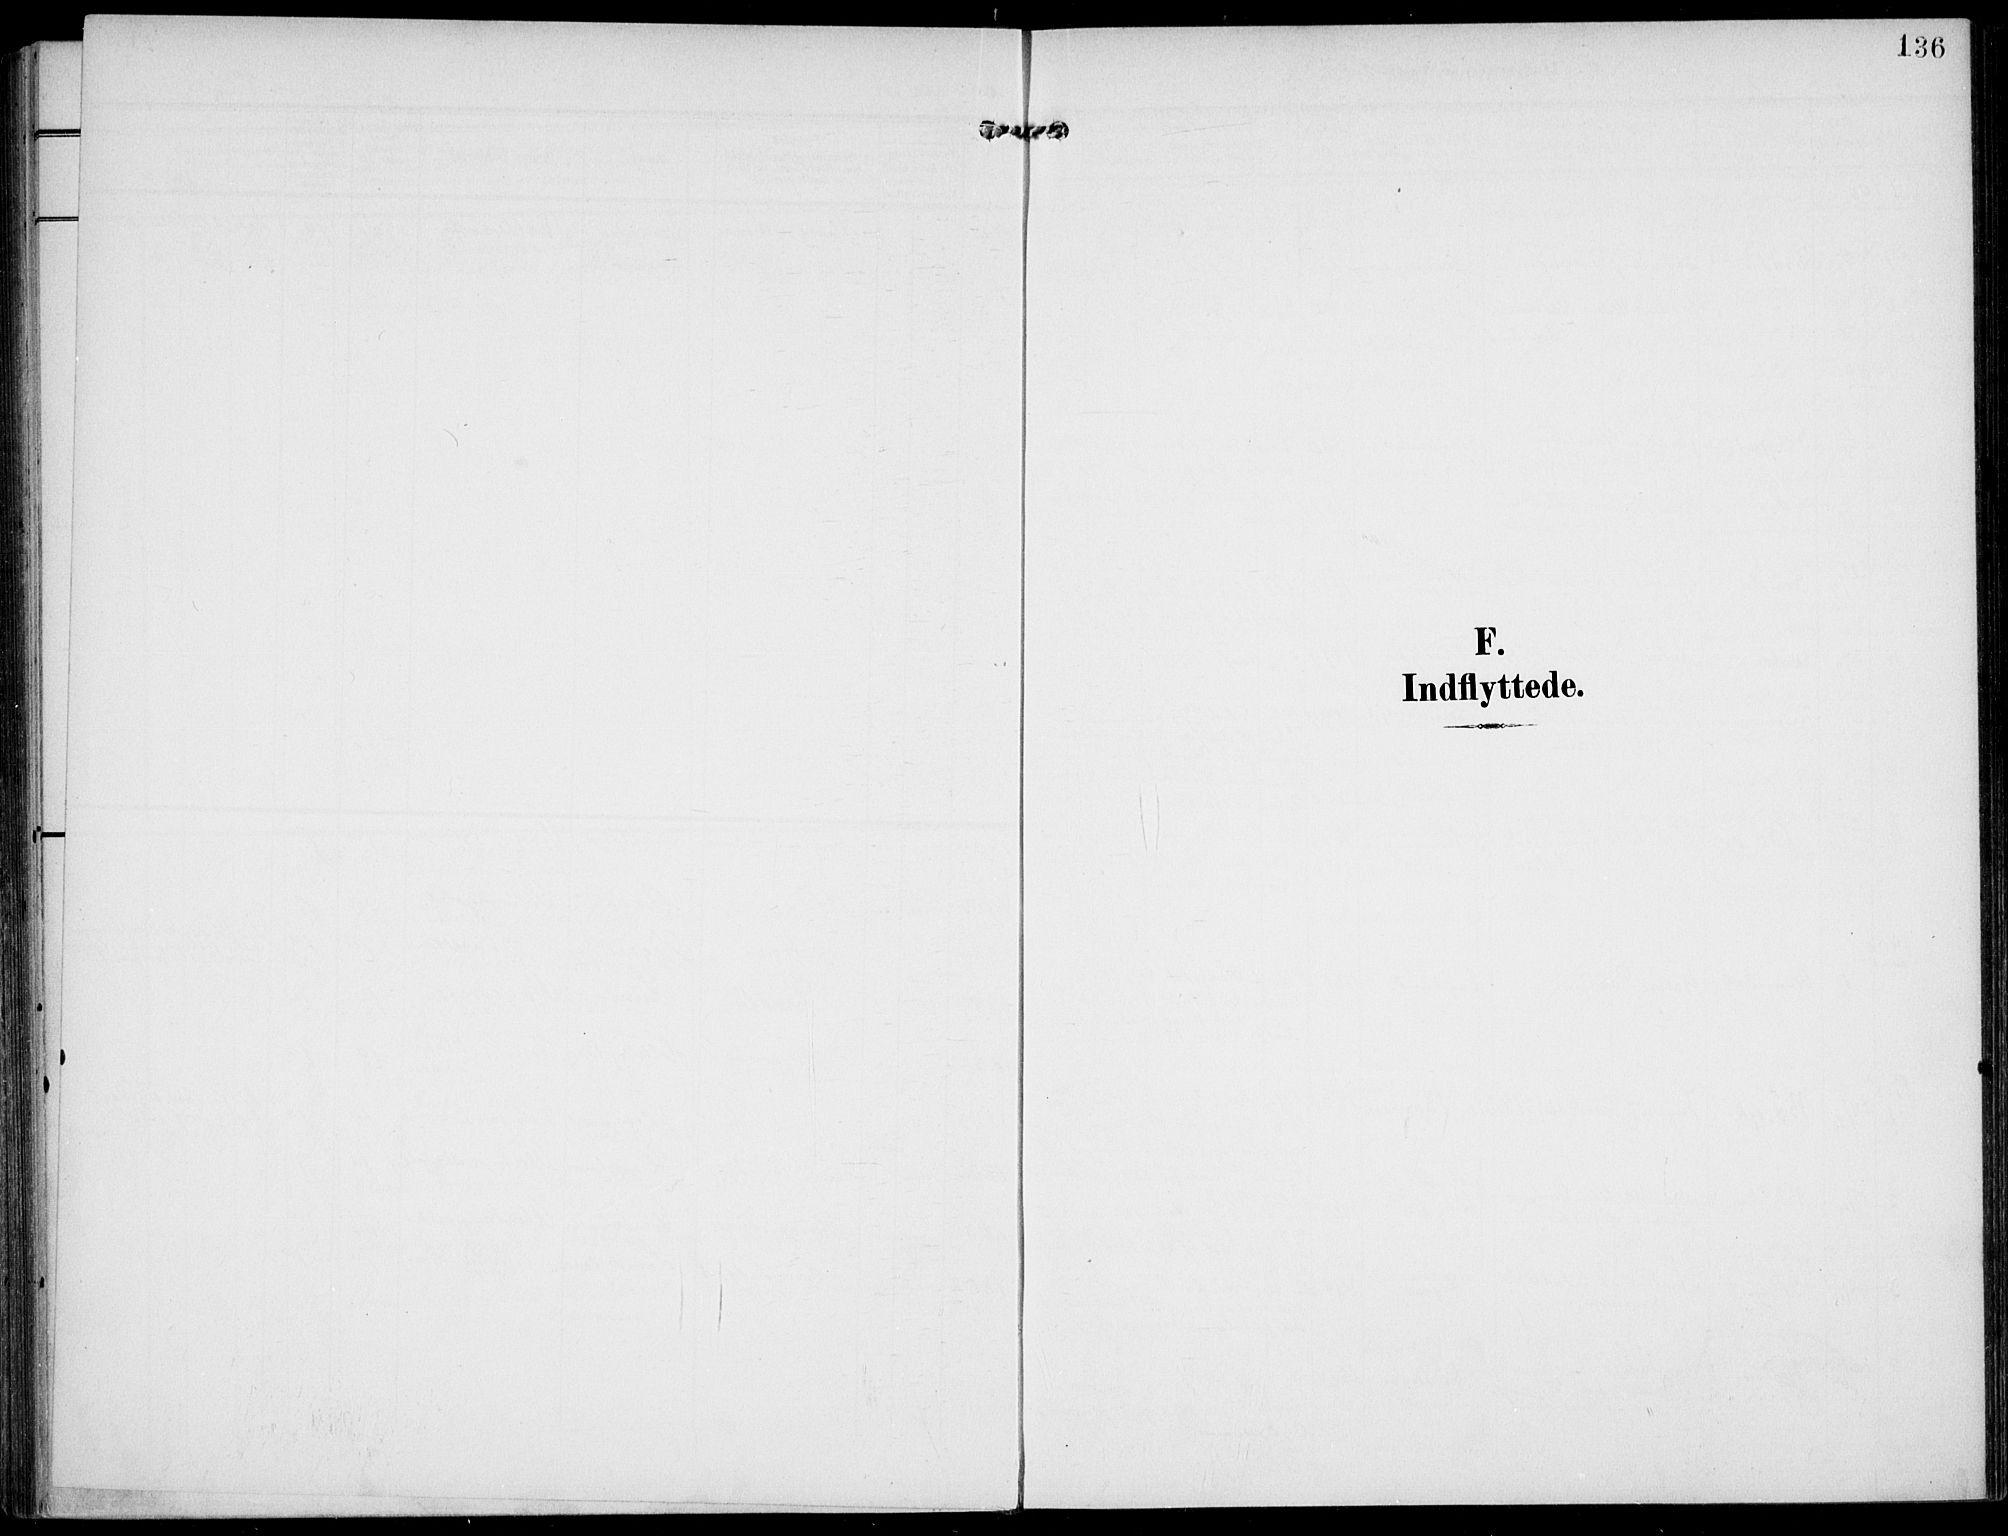 SAKO, Lunde kirkebøker, F/Fa/L0004: Ministerialbok nr. I 4, 1902-1913, s. 136